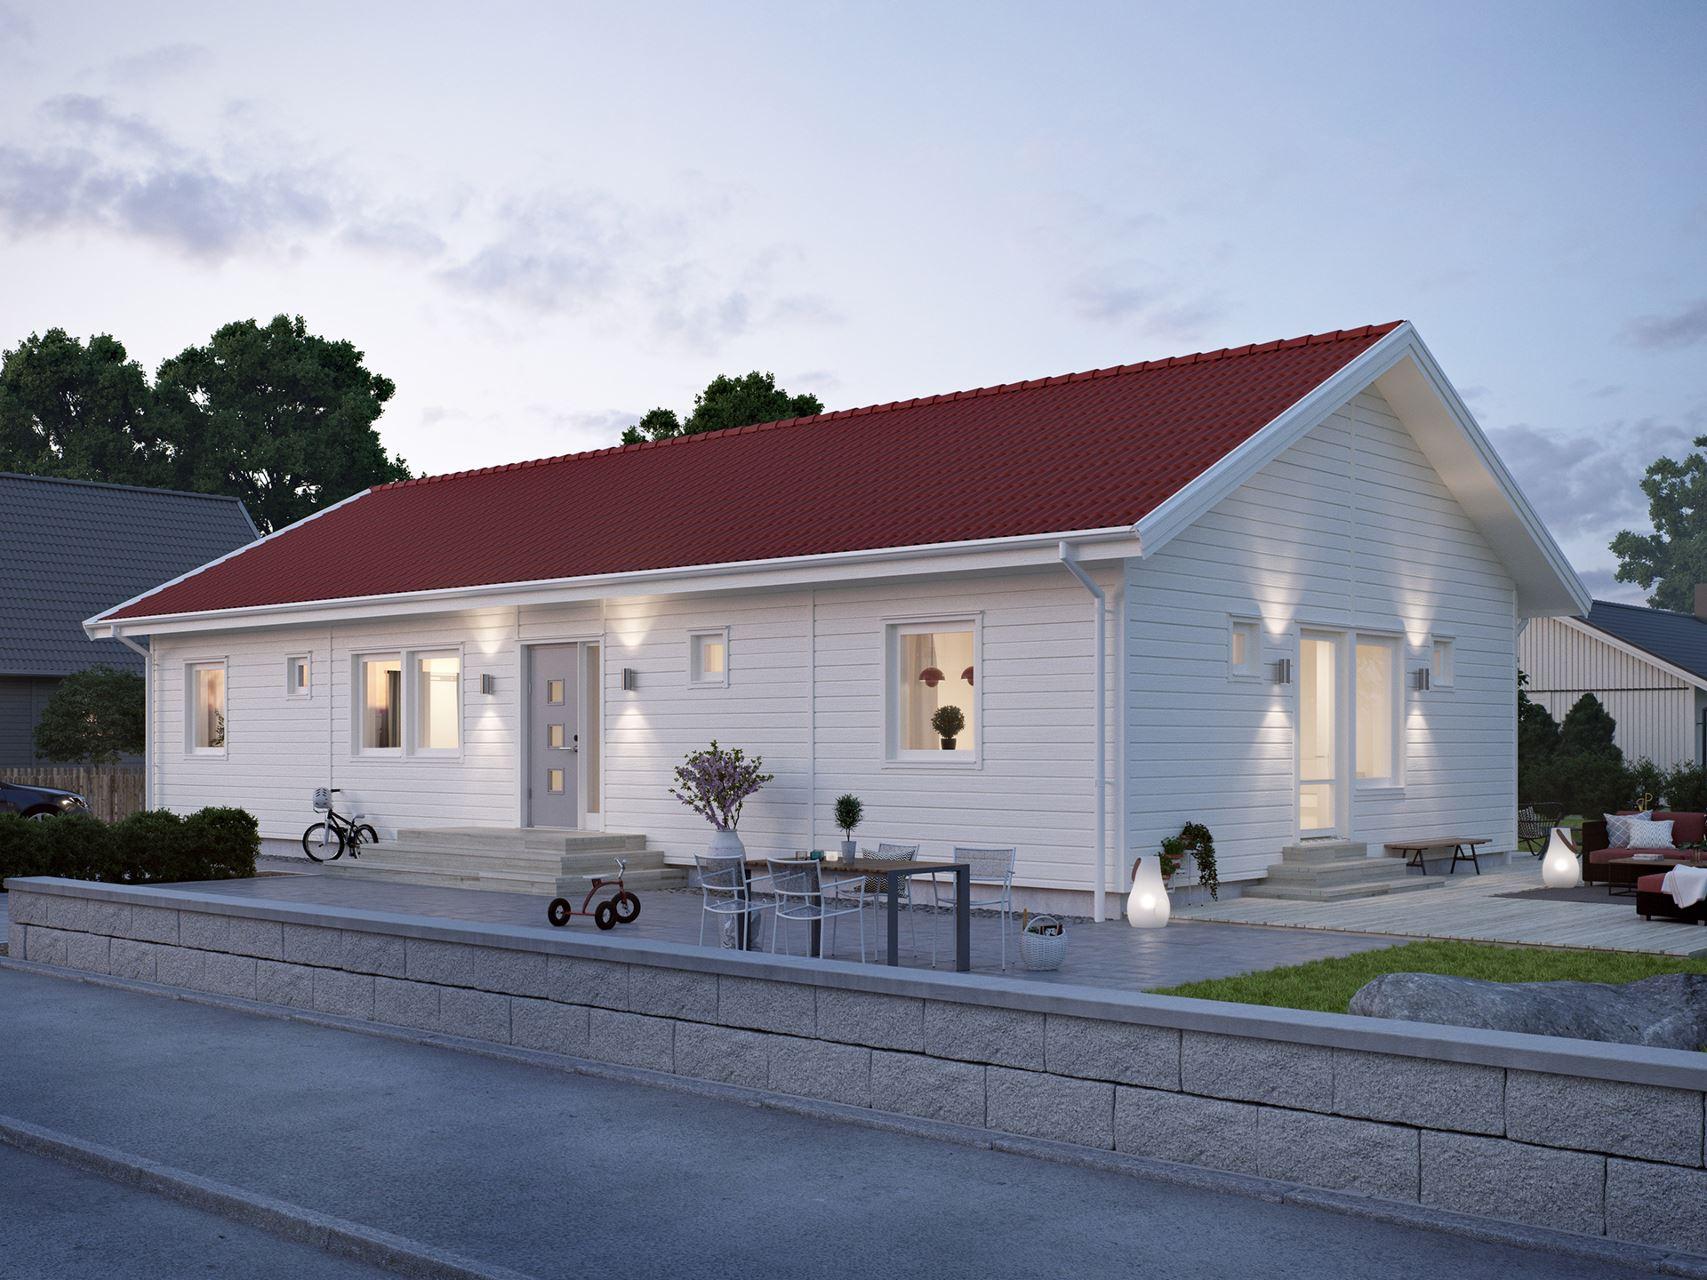 Gråbo Vårdcentral